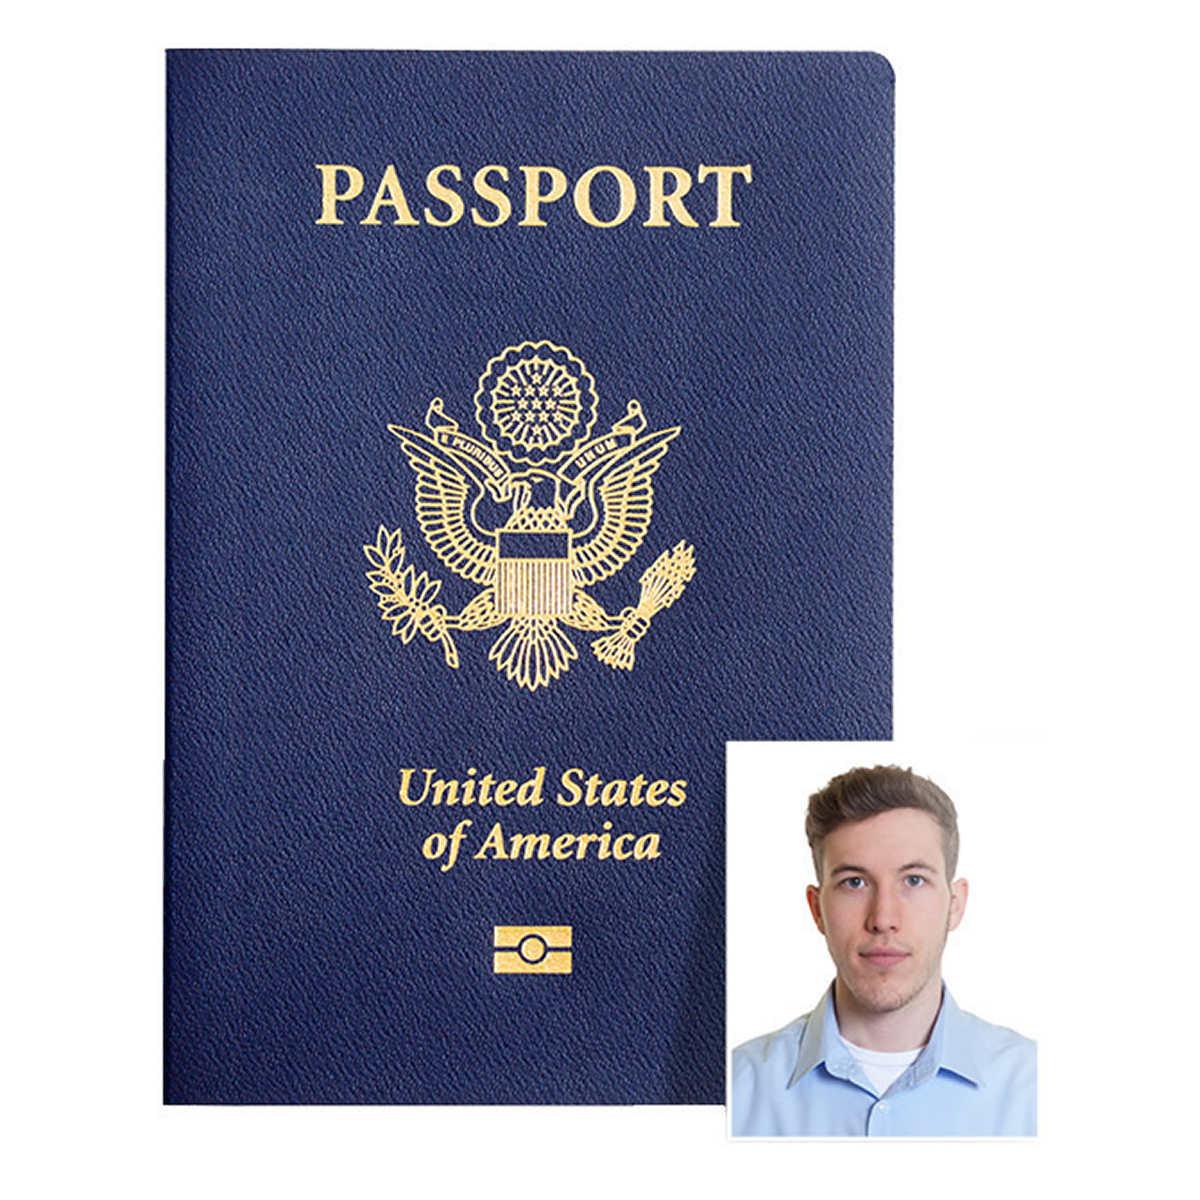 passport permanent resident and citizenship photos